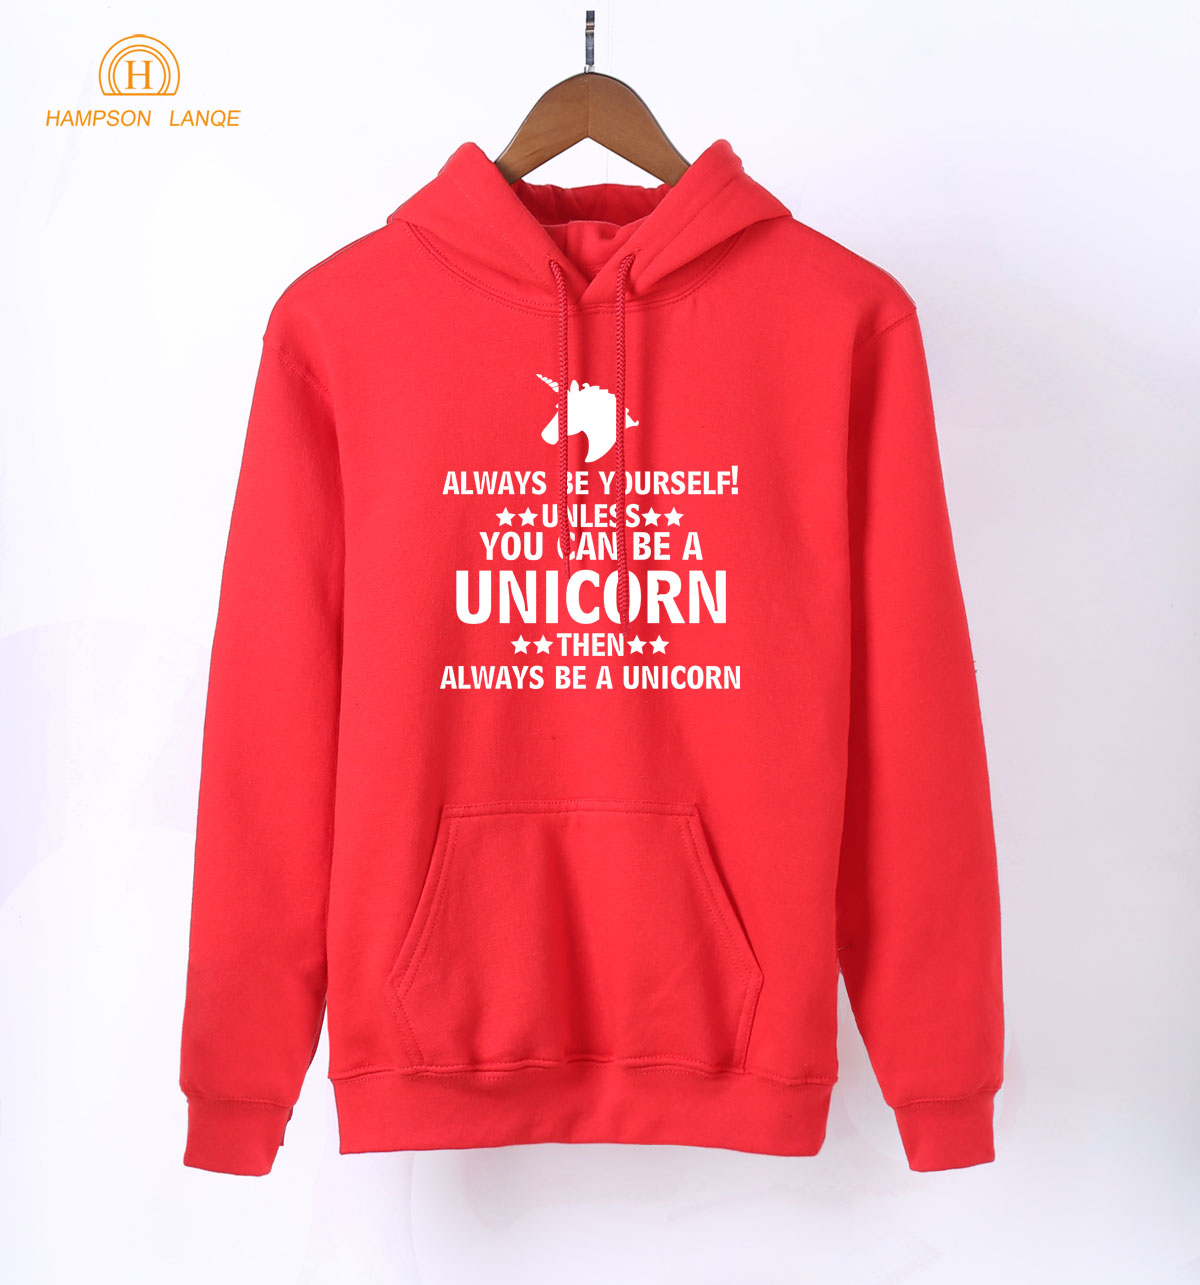 Always Be Yourself Unless You Can Be A  2019 Spring Autumn Kawaii Sweatshirts Women K-pop Hoodies Pink Warm Fleece Hoodie